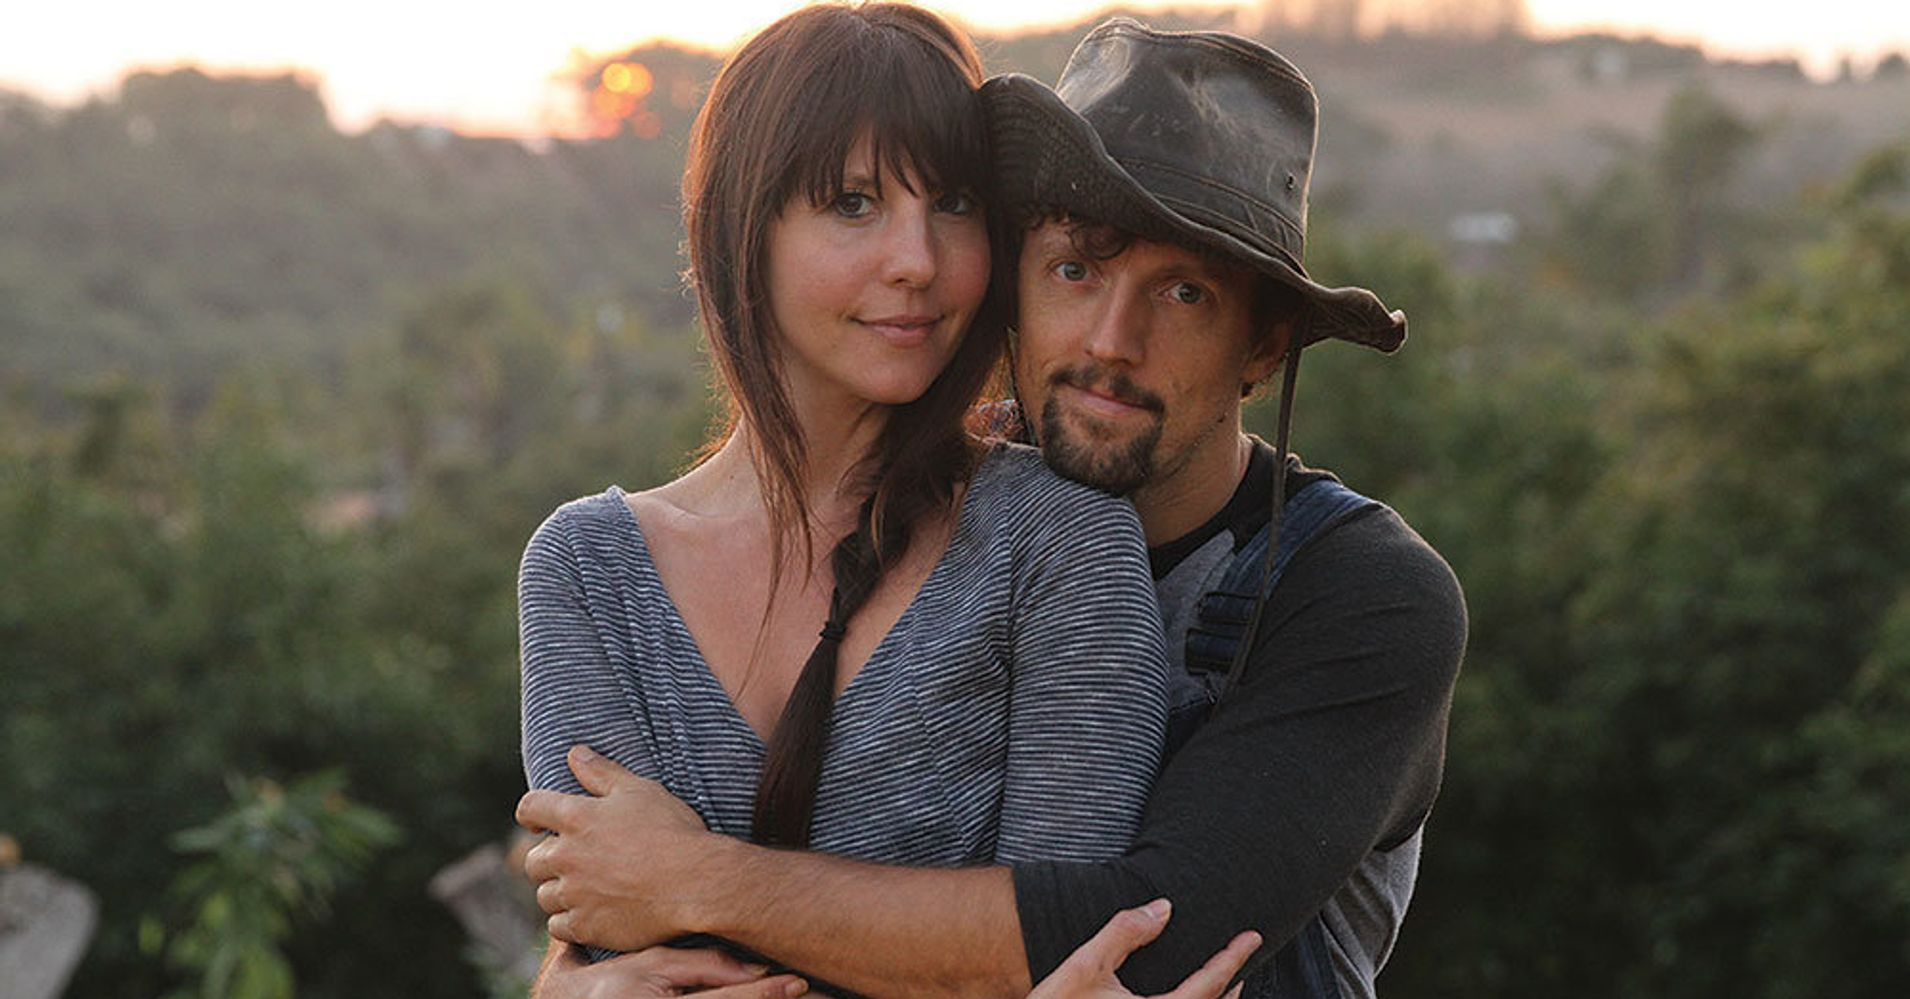 Jason Mraz Marries Christina Carano In Beautiful Hometown